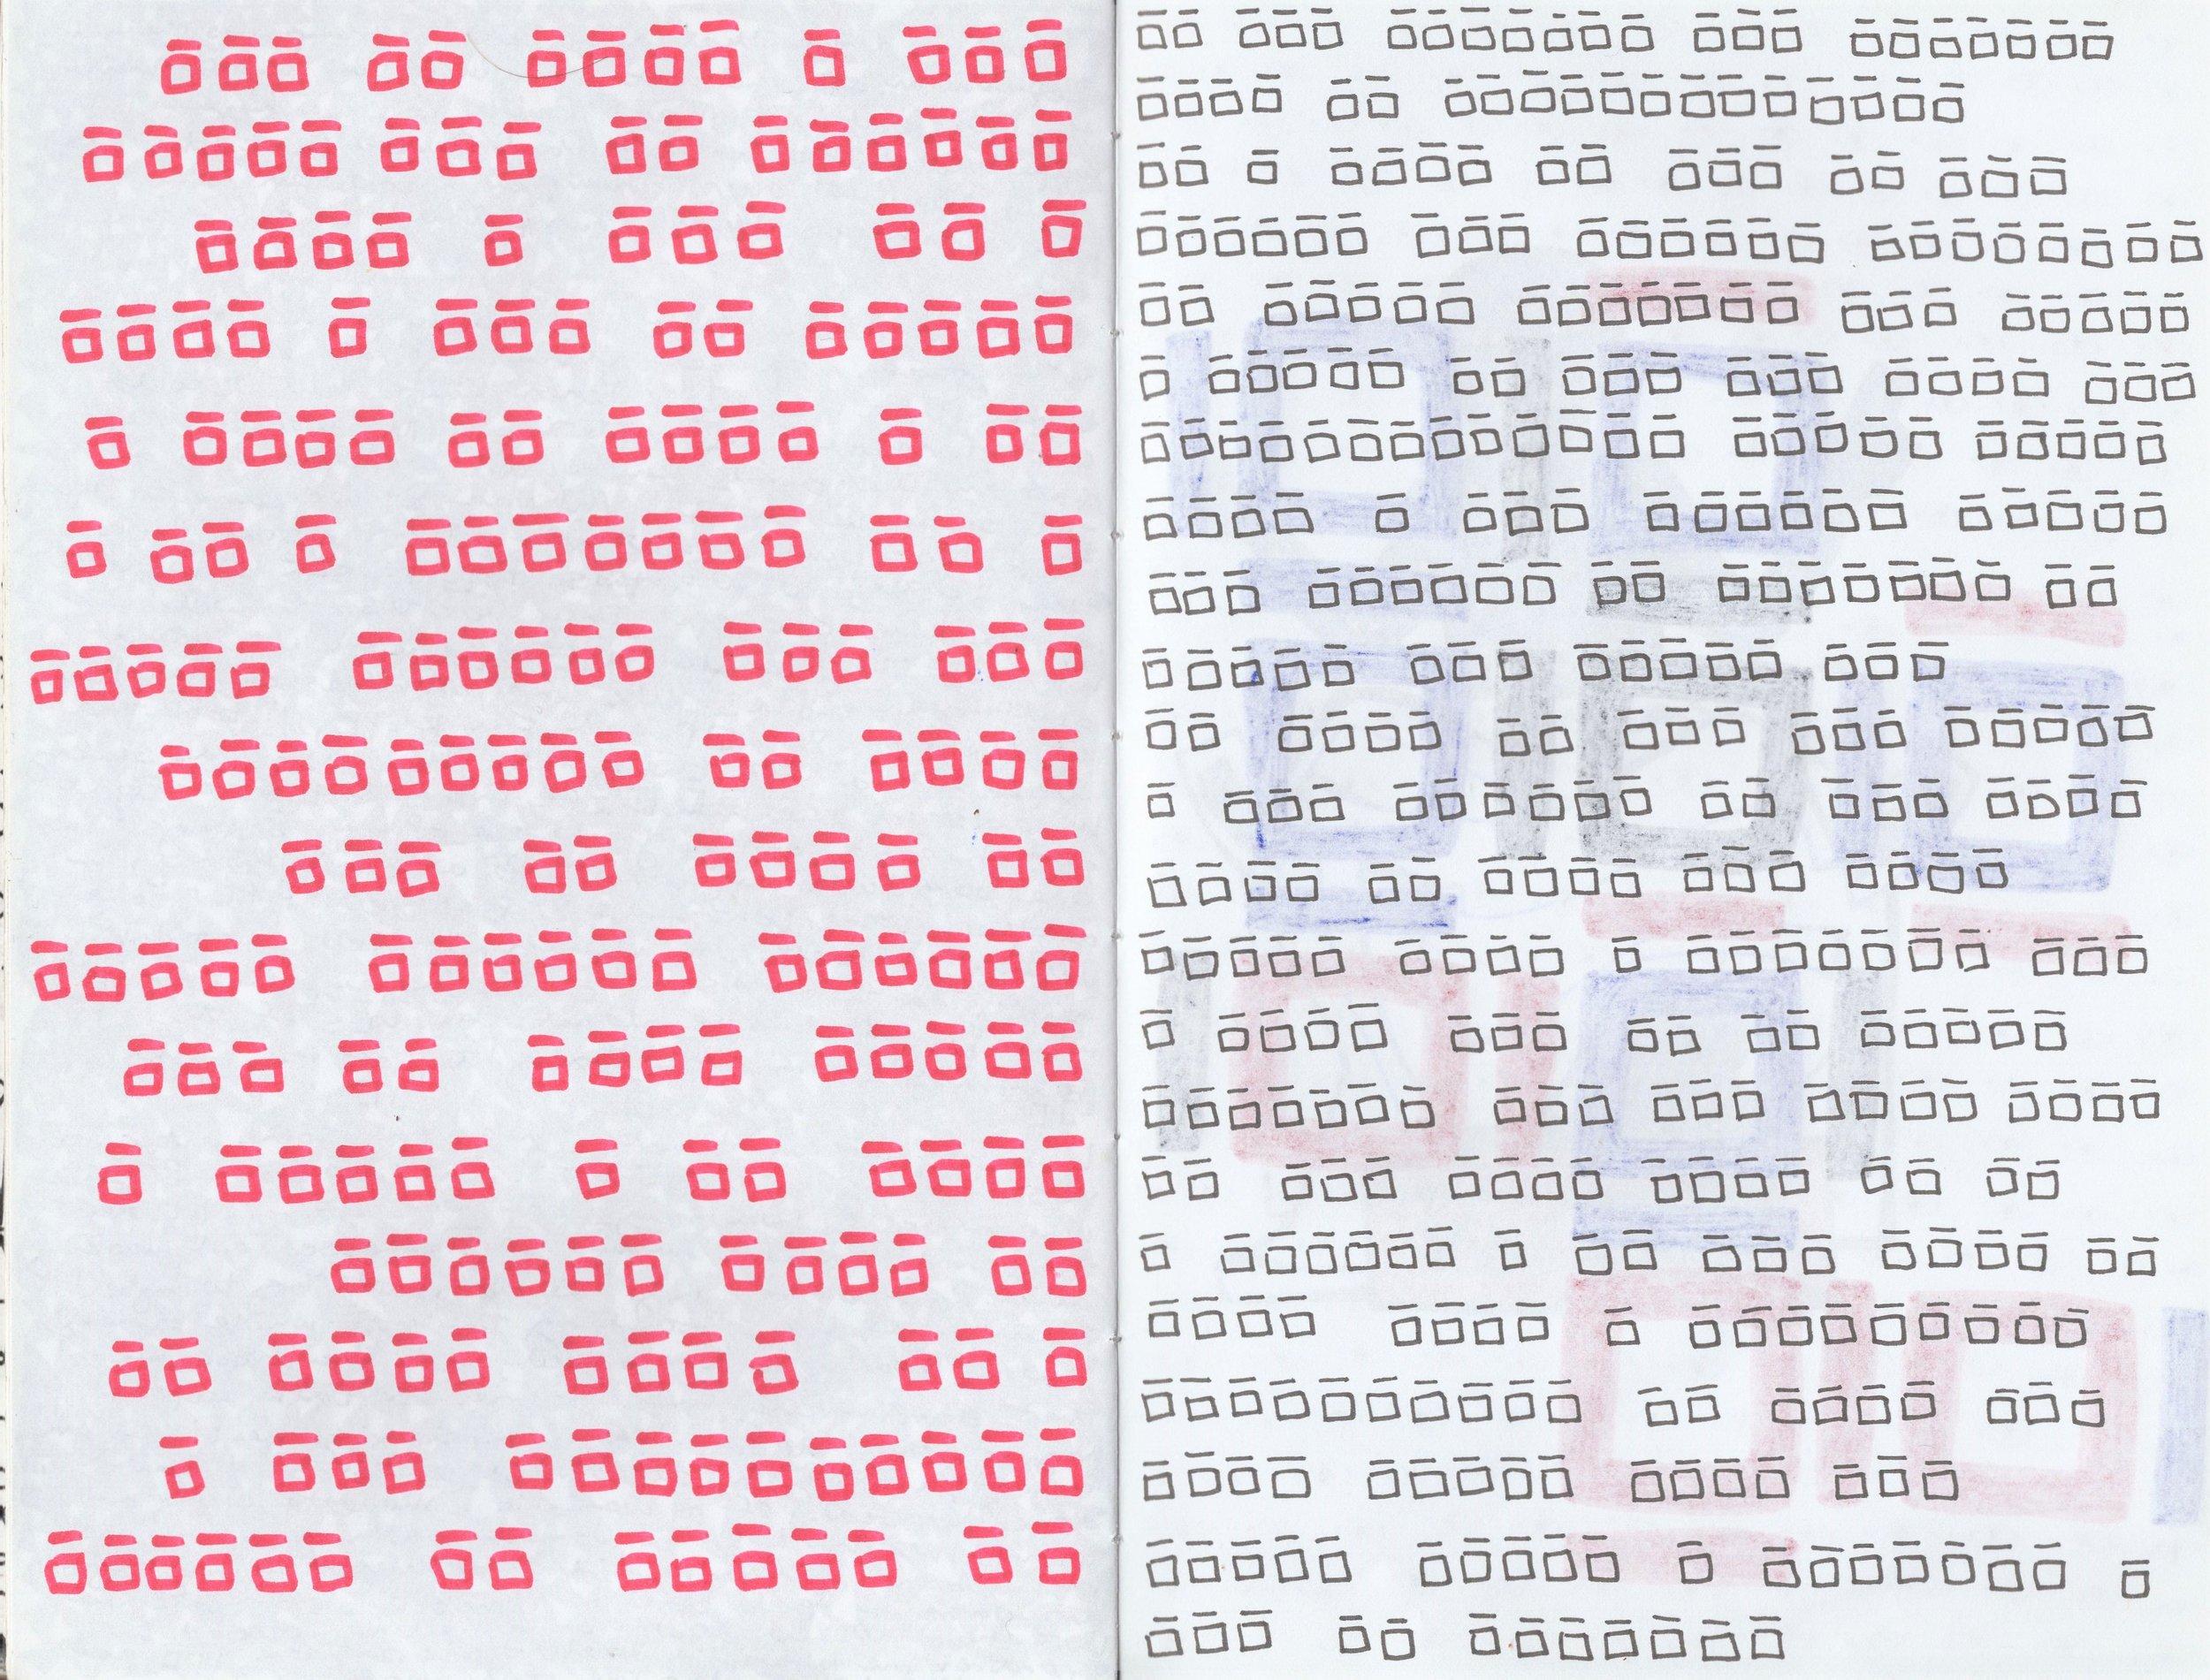 escan069.jpg